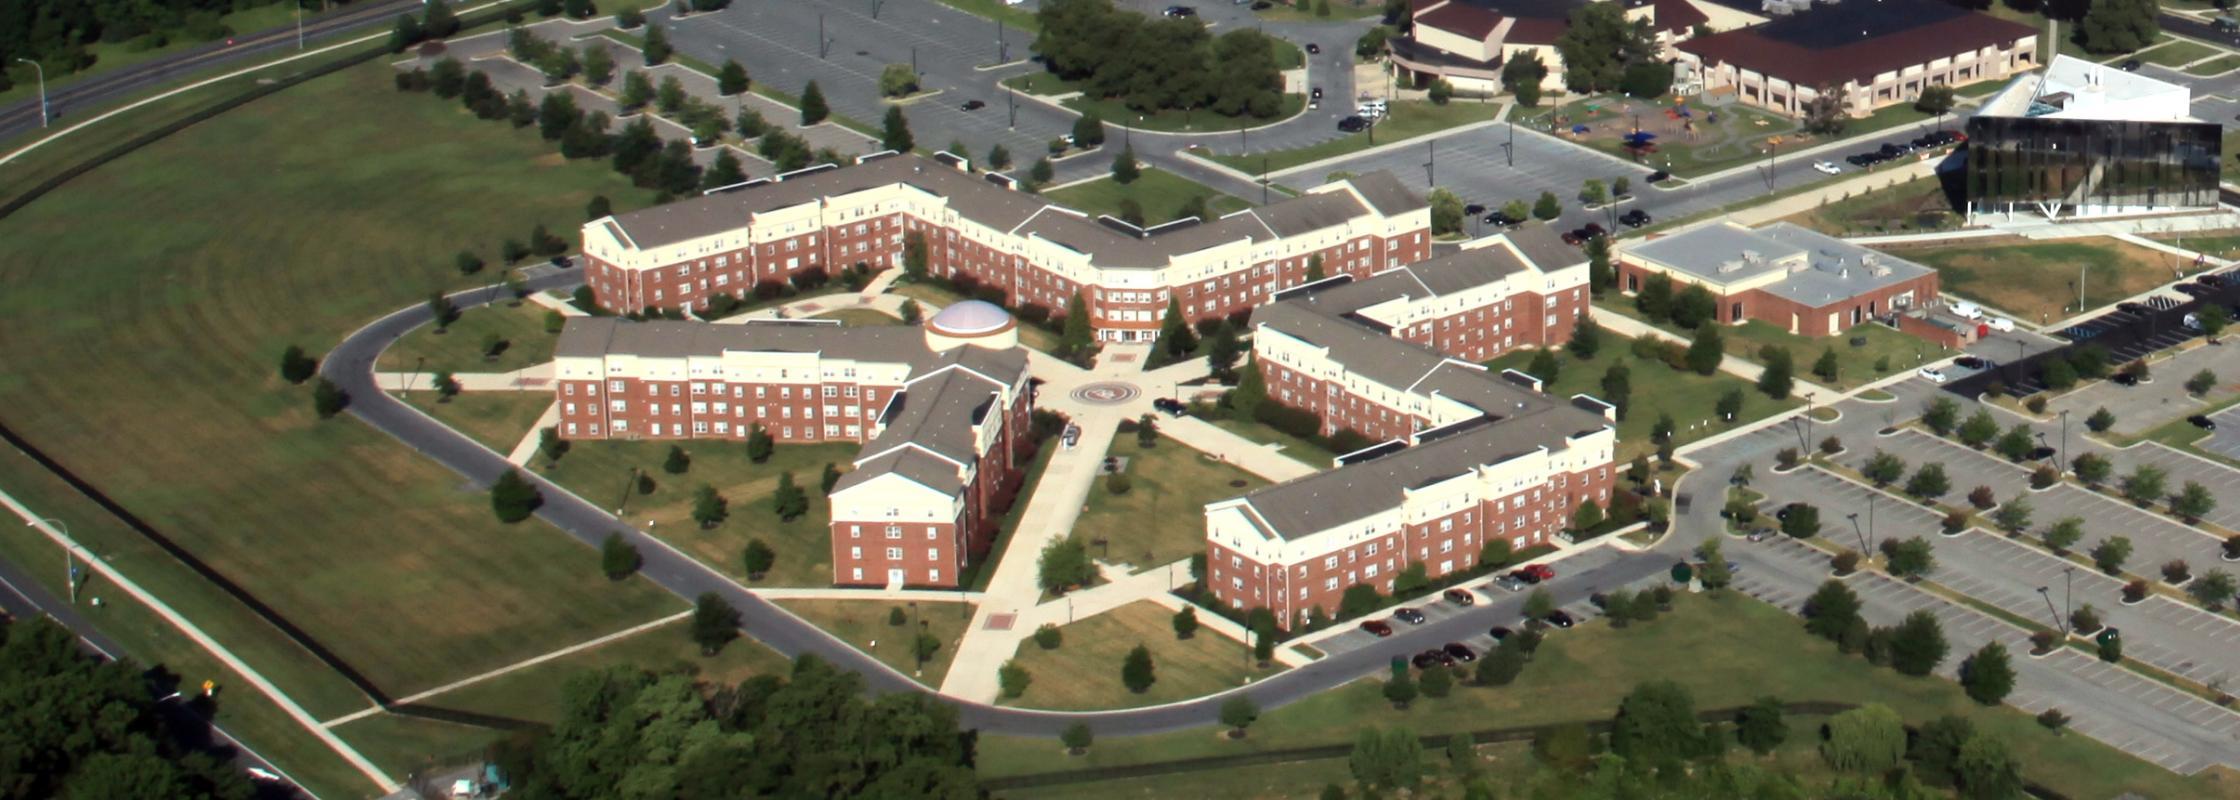 University Village aerial photo